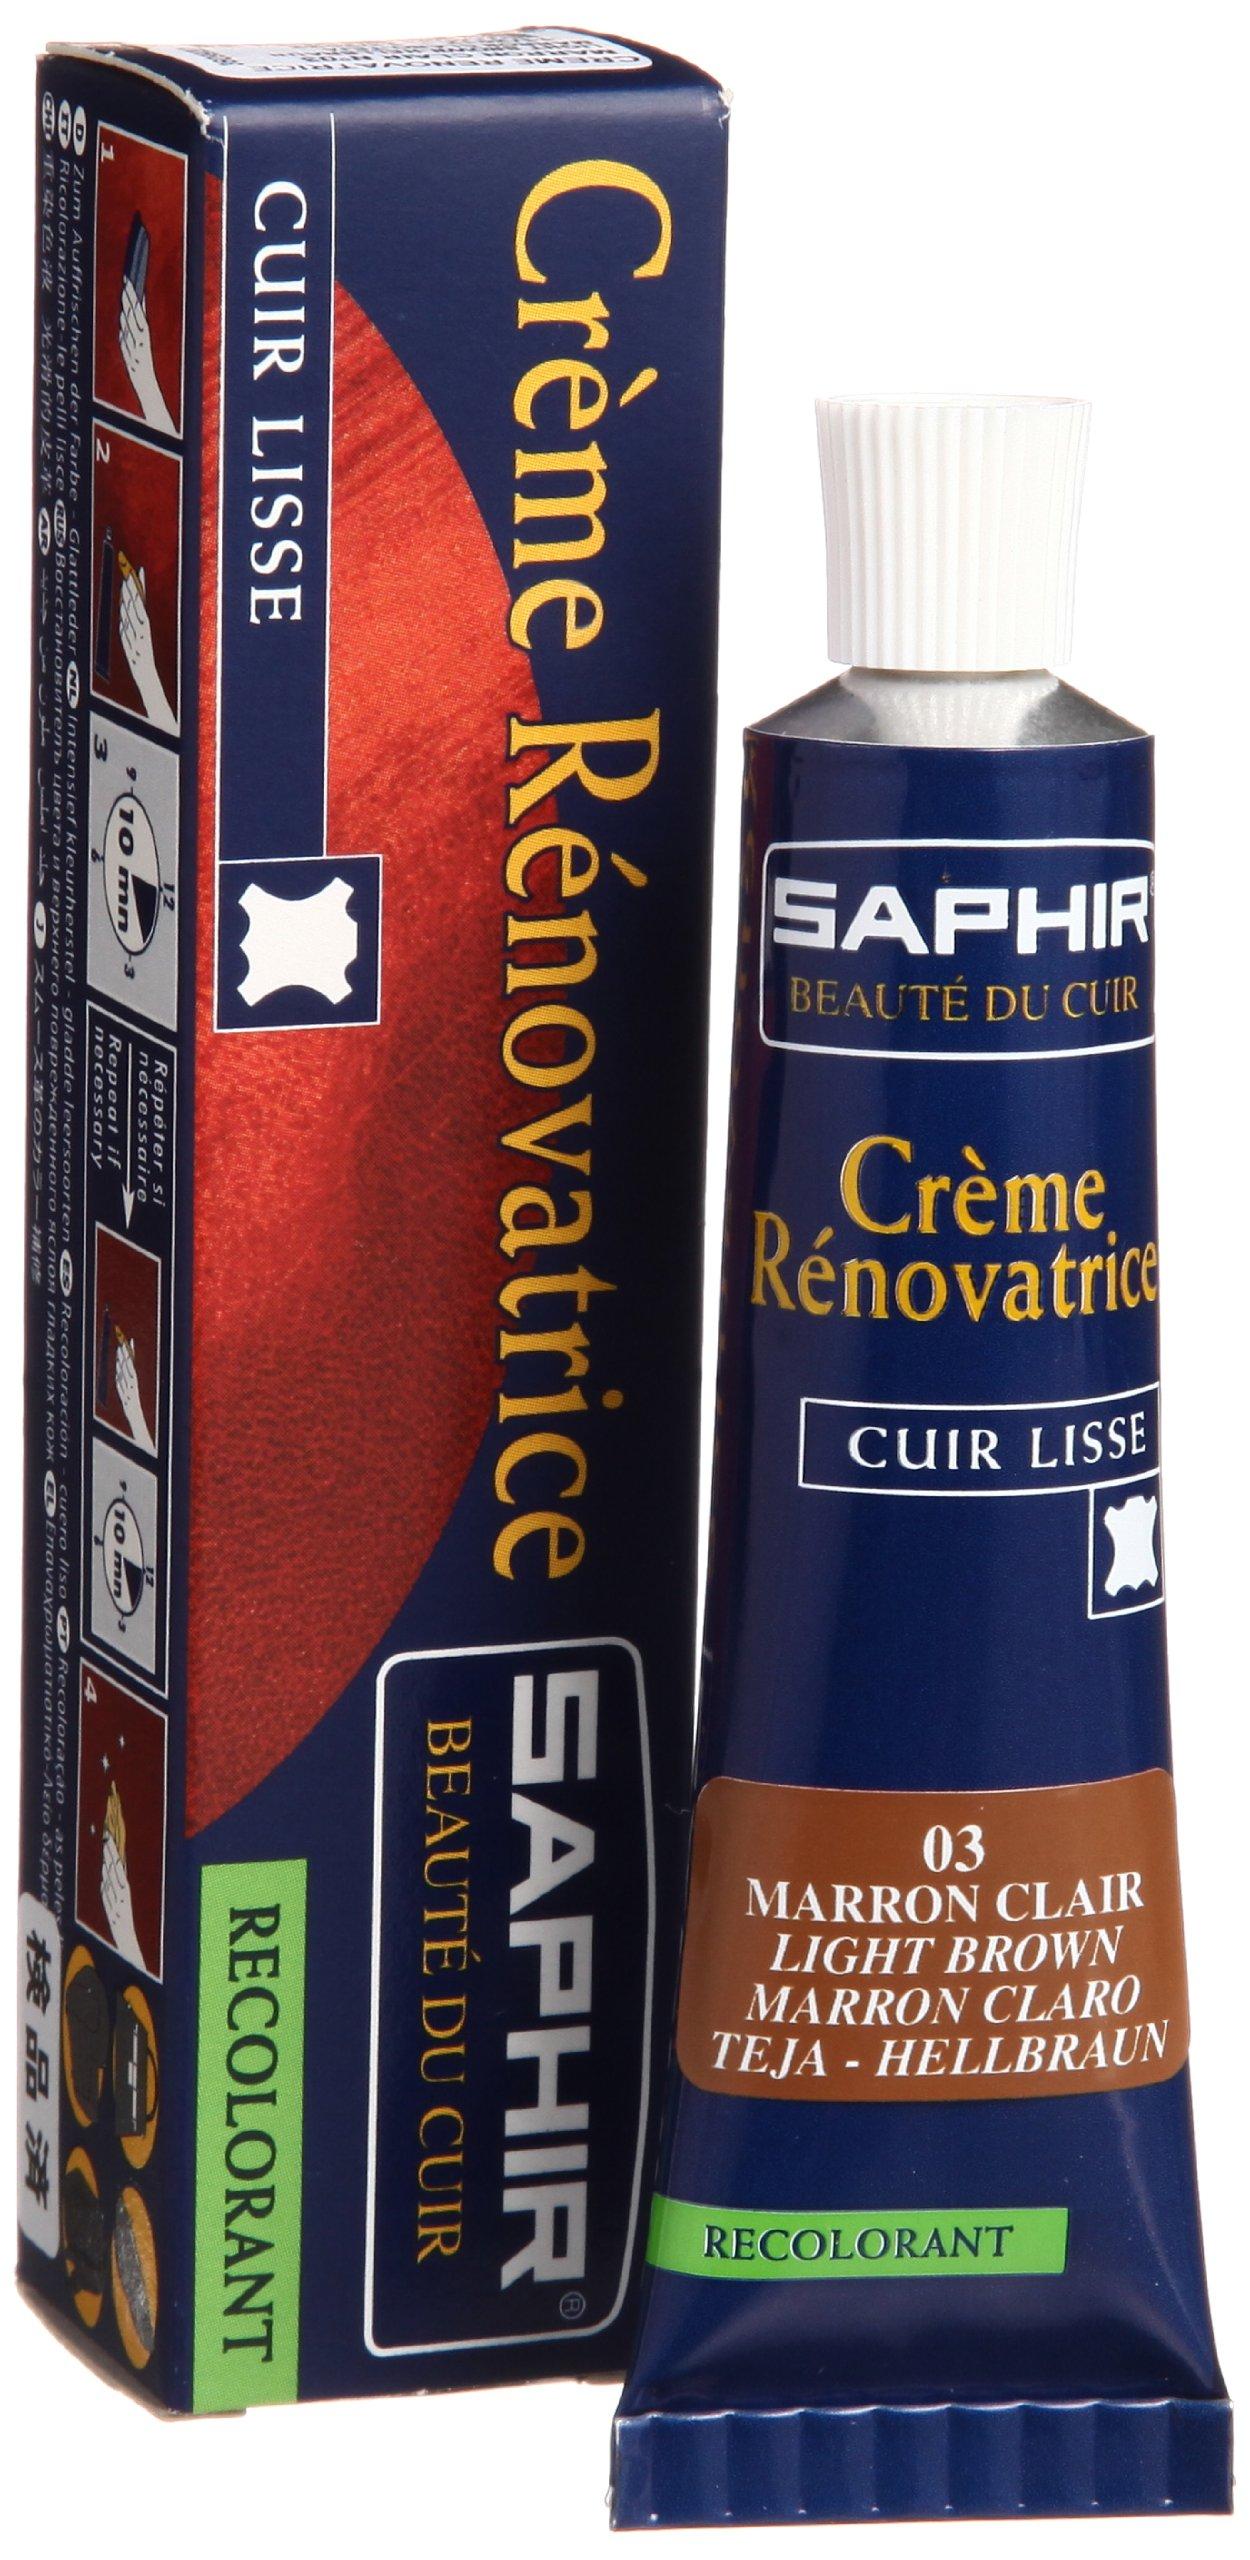 Saphir Renovating Cream - Tube - 25 Ml. (Light Brown)